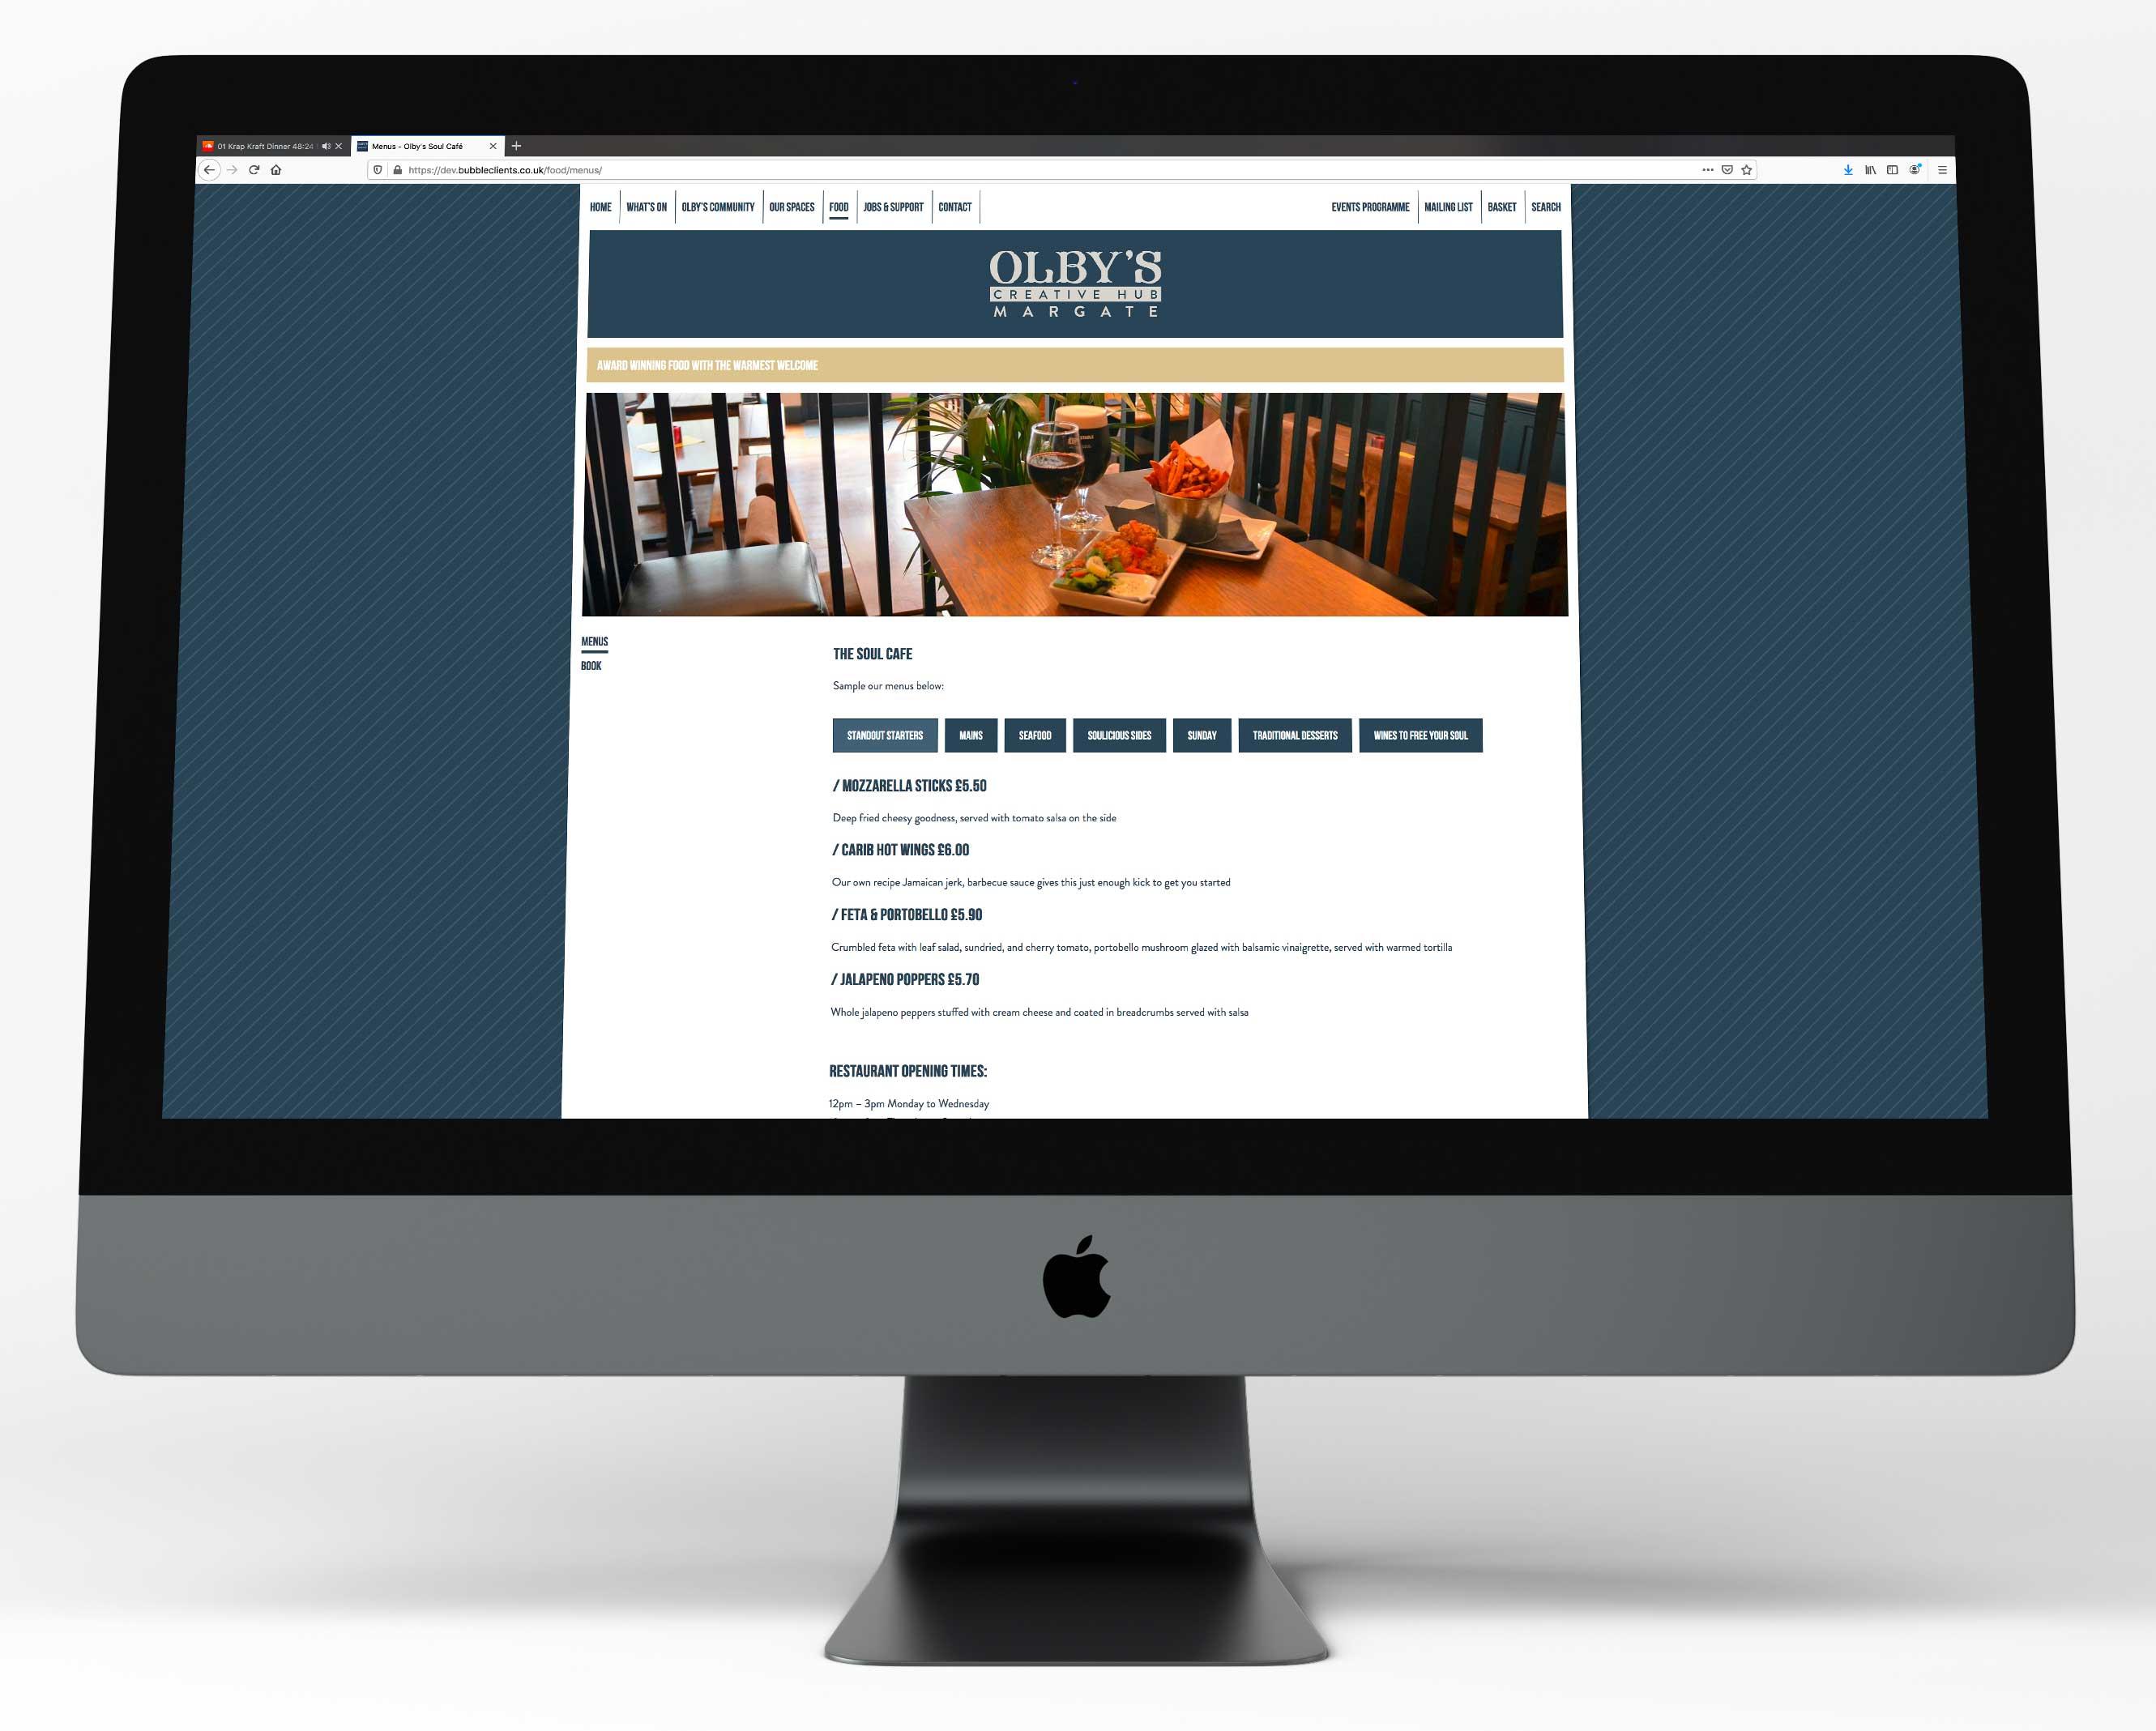 Olbys website - food